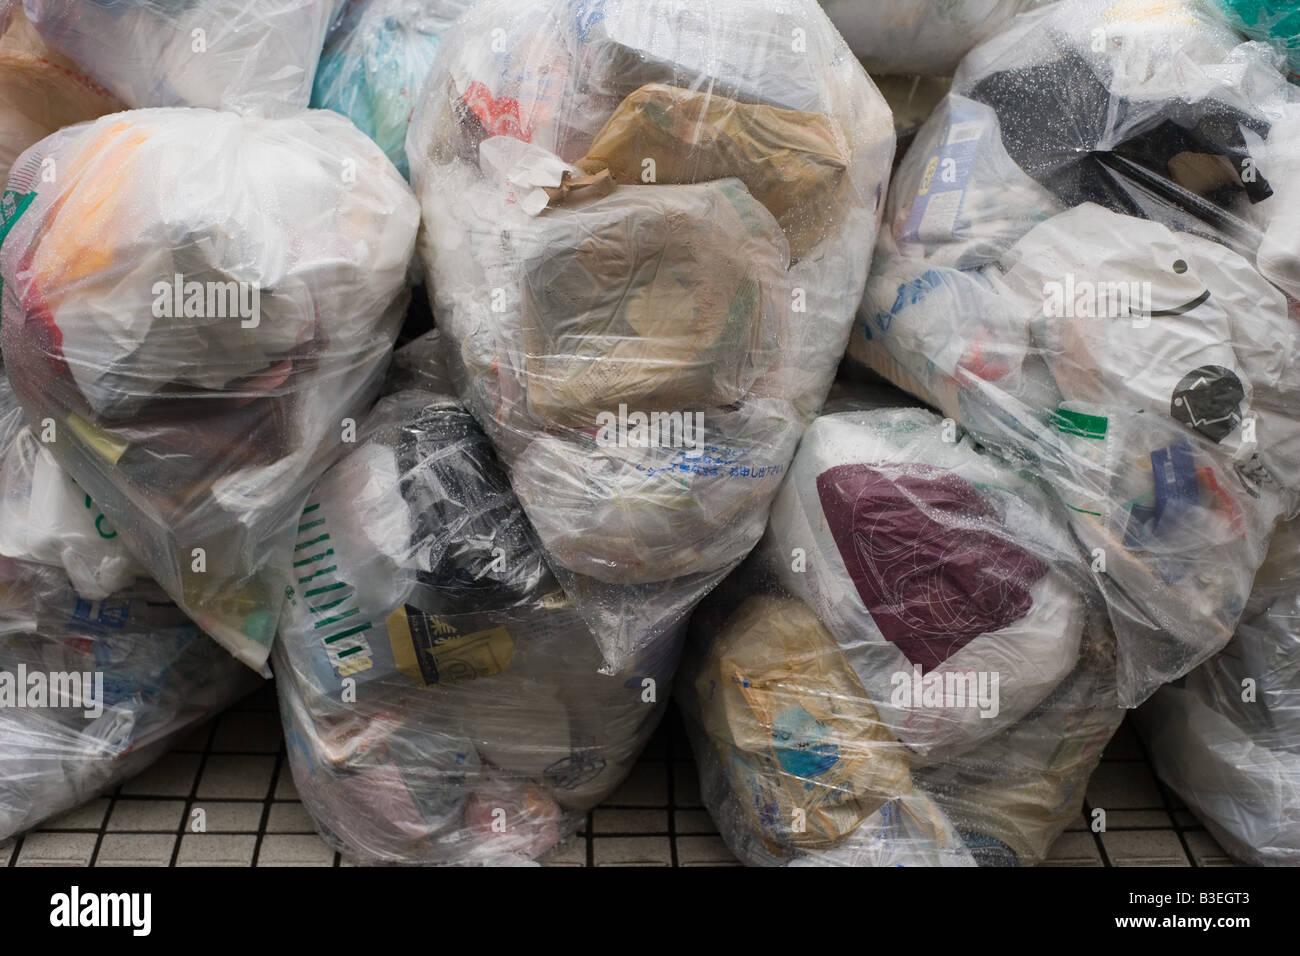 Rubbish bags - Stock Image